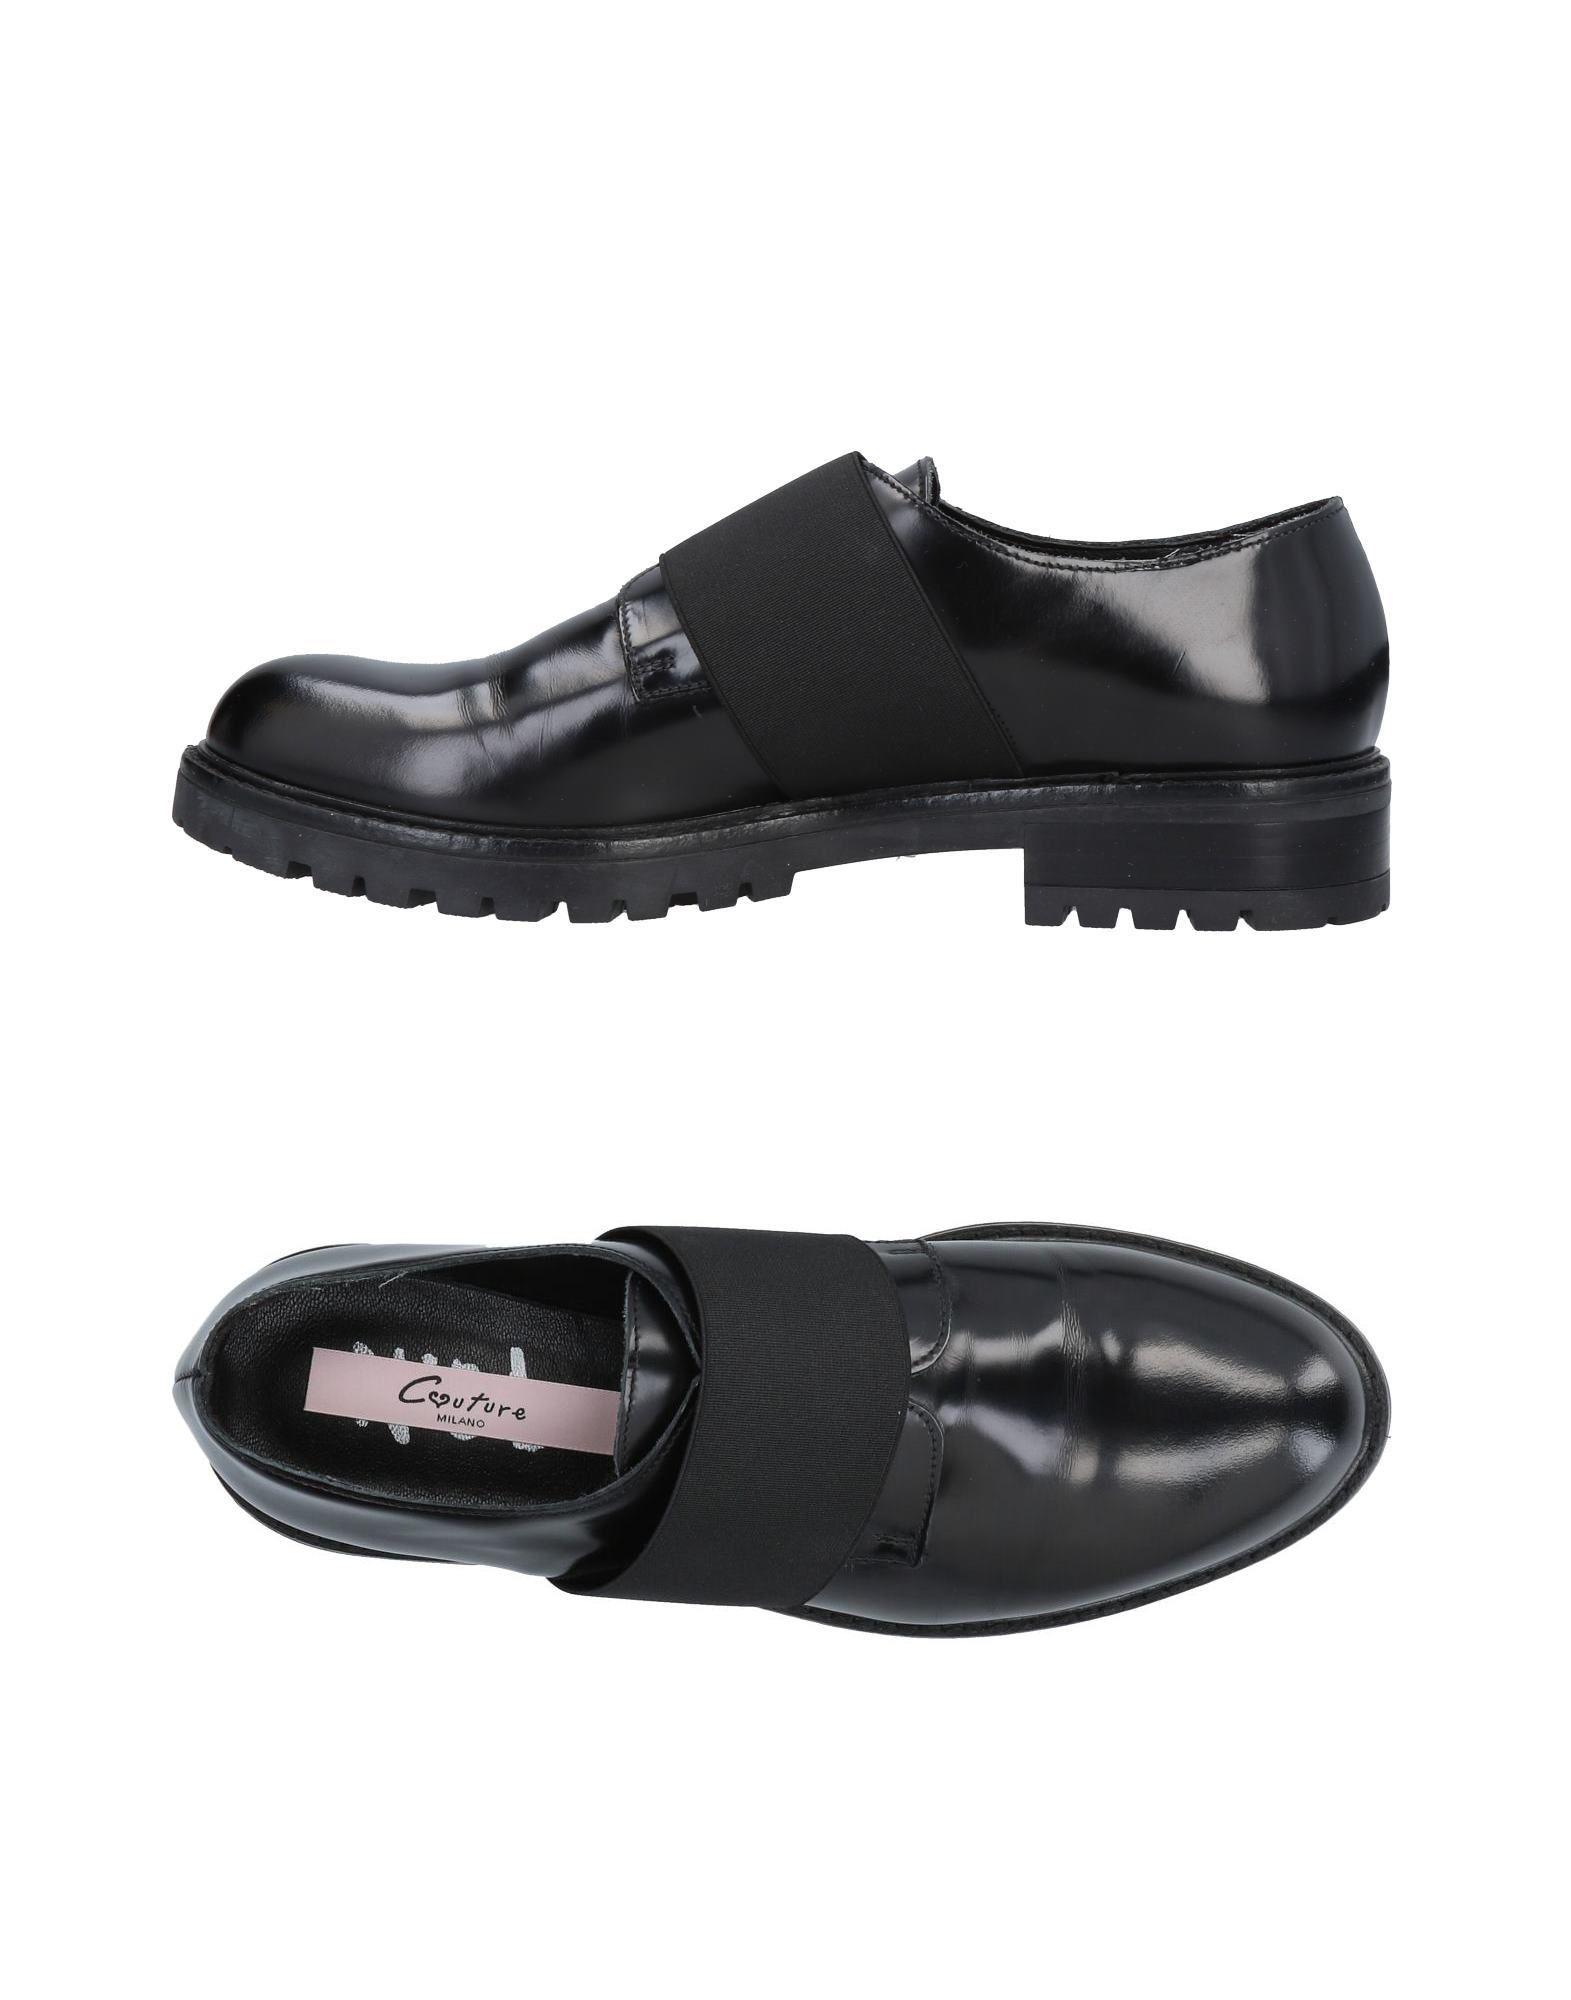 Couture Gute Mokassins Damen  11486483VR Gute Couture Qualität beliebte Schuhe 397dfa